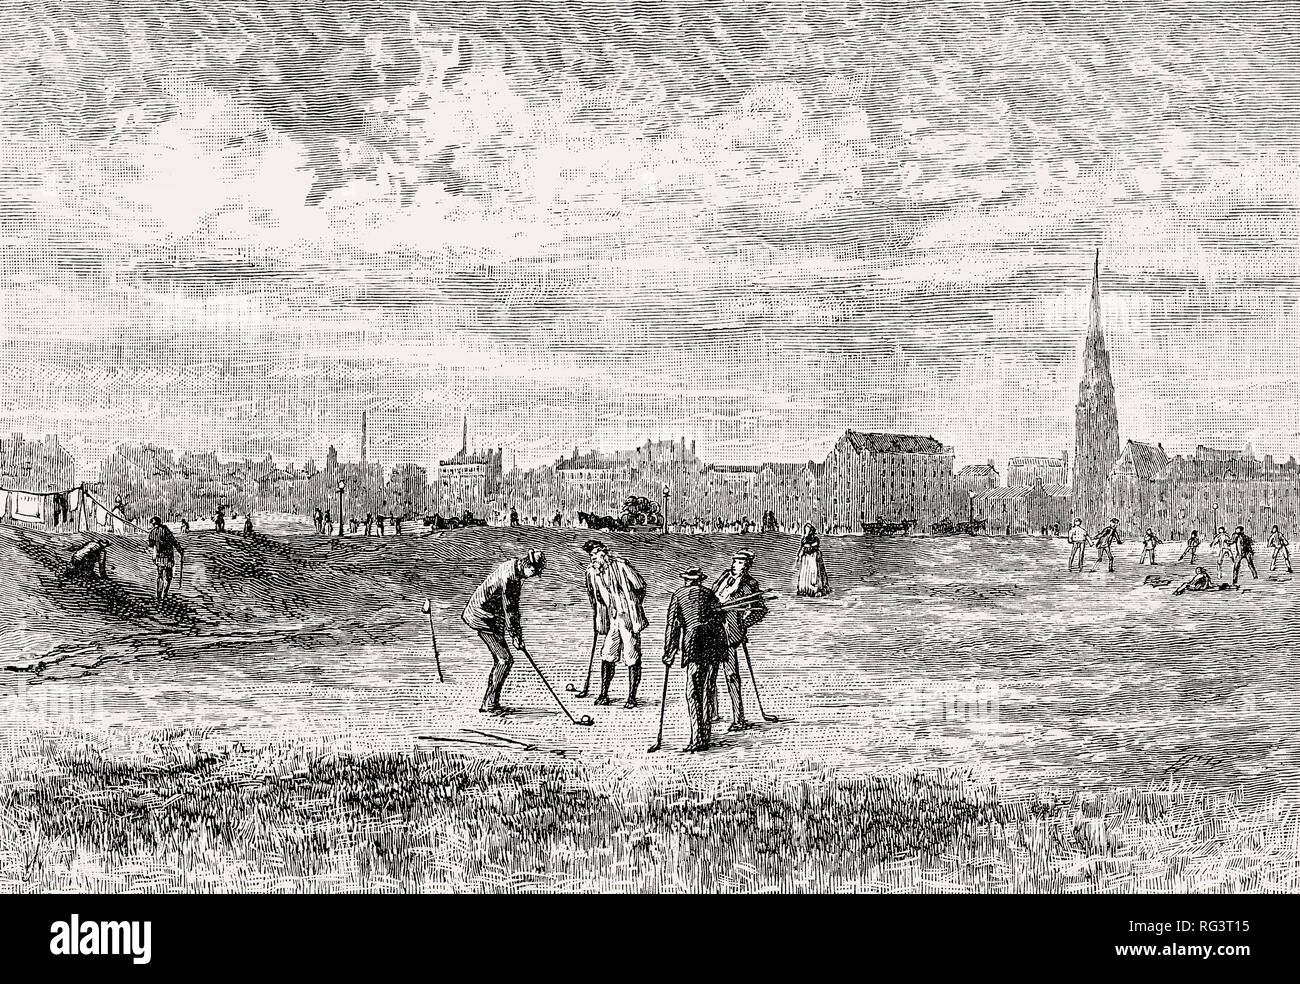 Golfers at Leith Links, Edinburgh, Scotland, 19th century - Stock Image